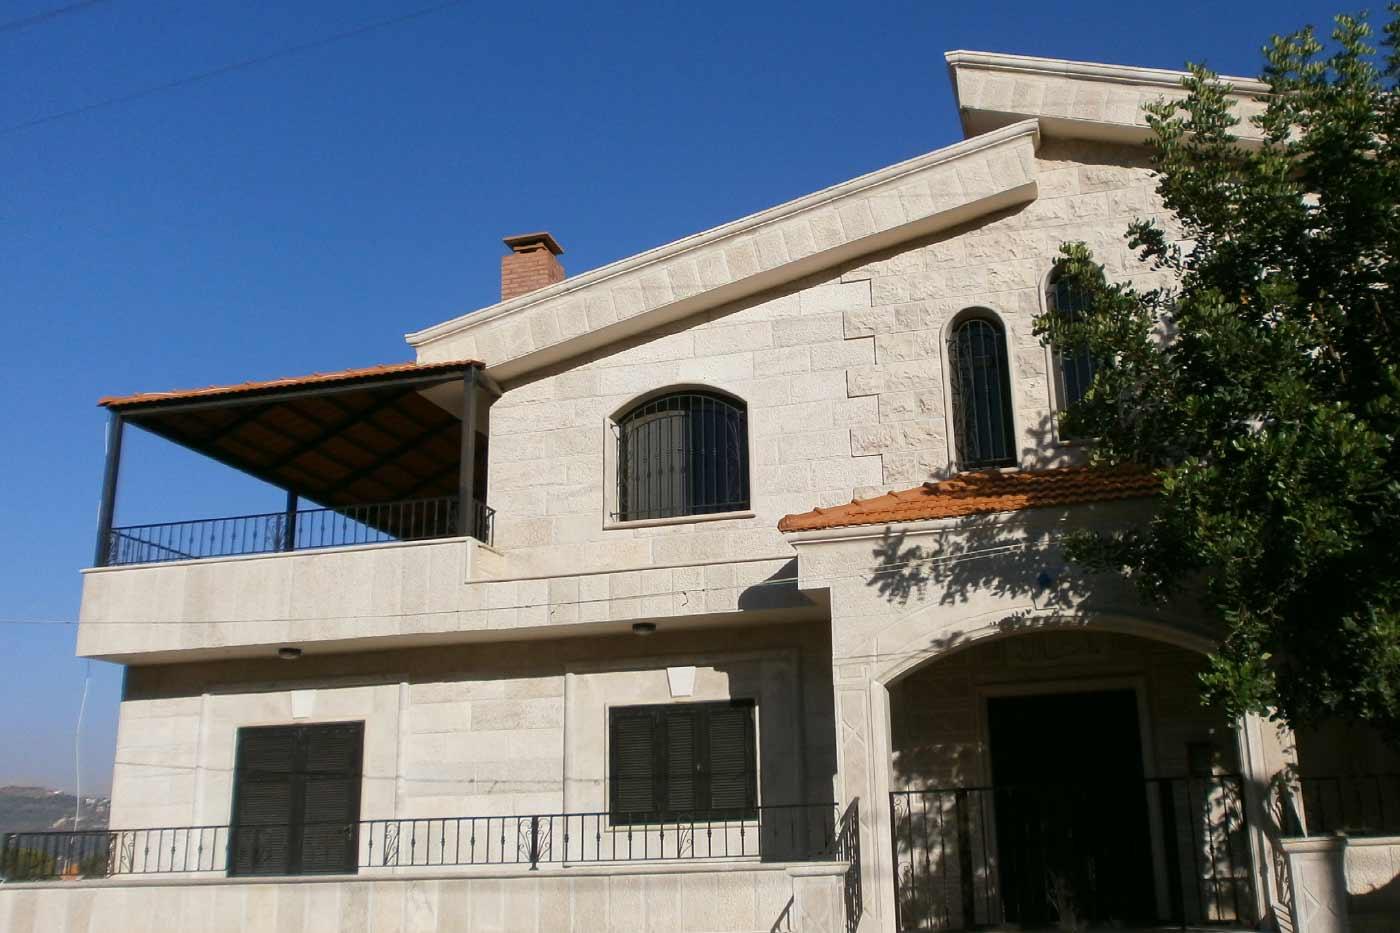 Merhi Villa Side View - Entrance & Balcony